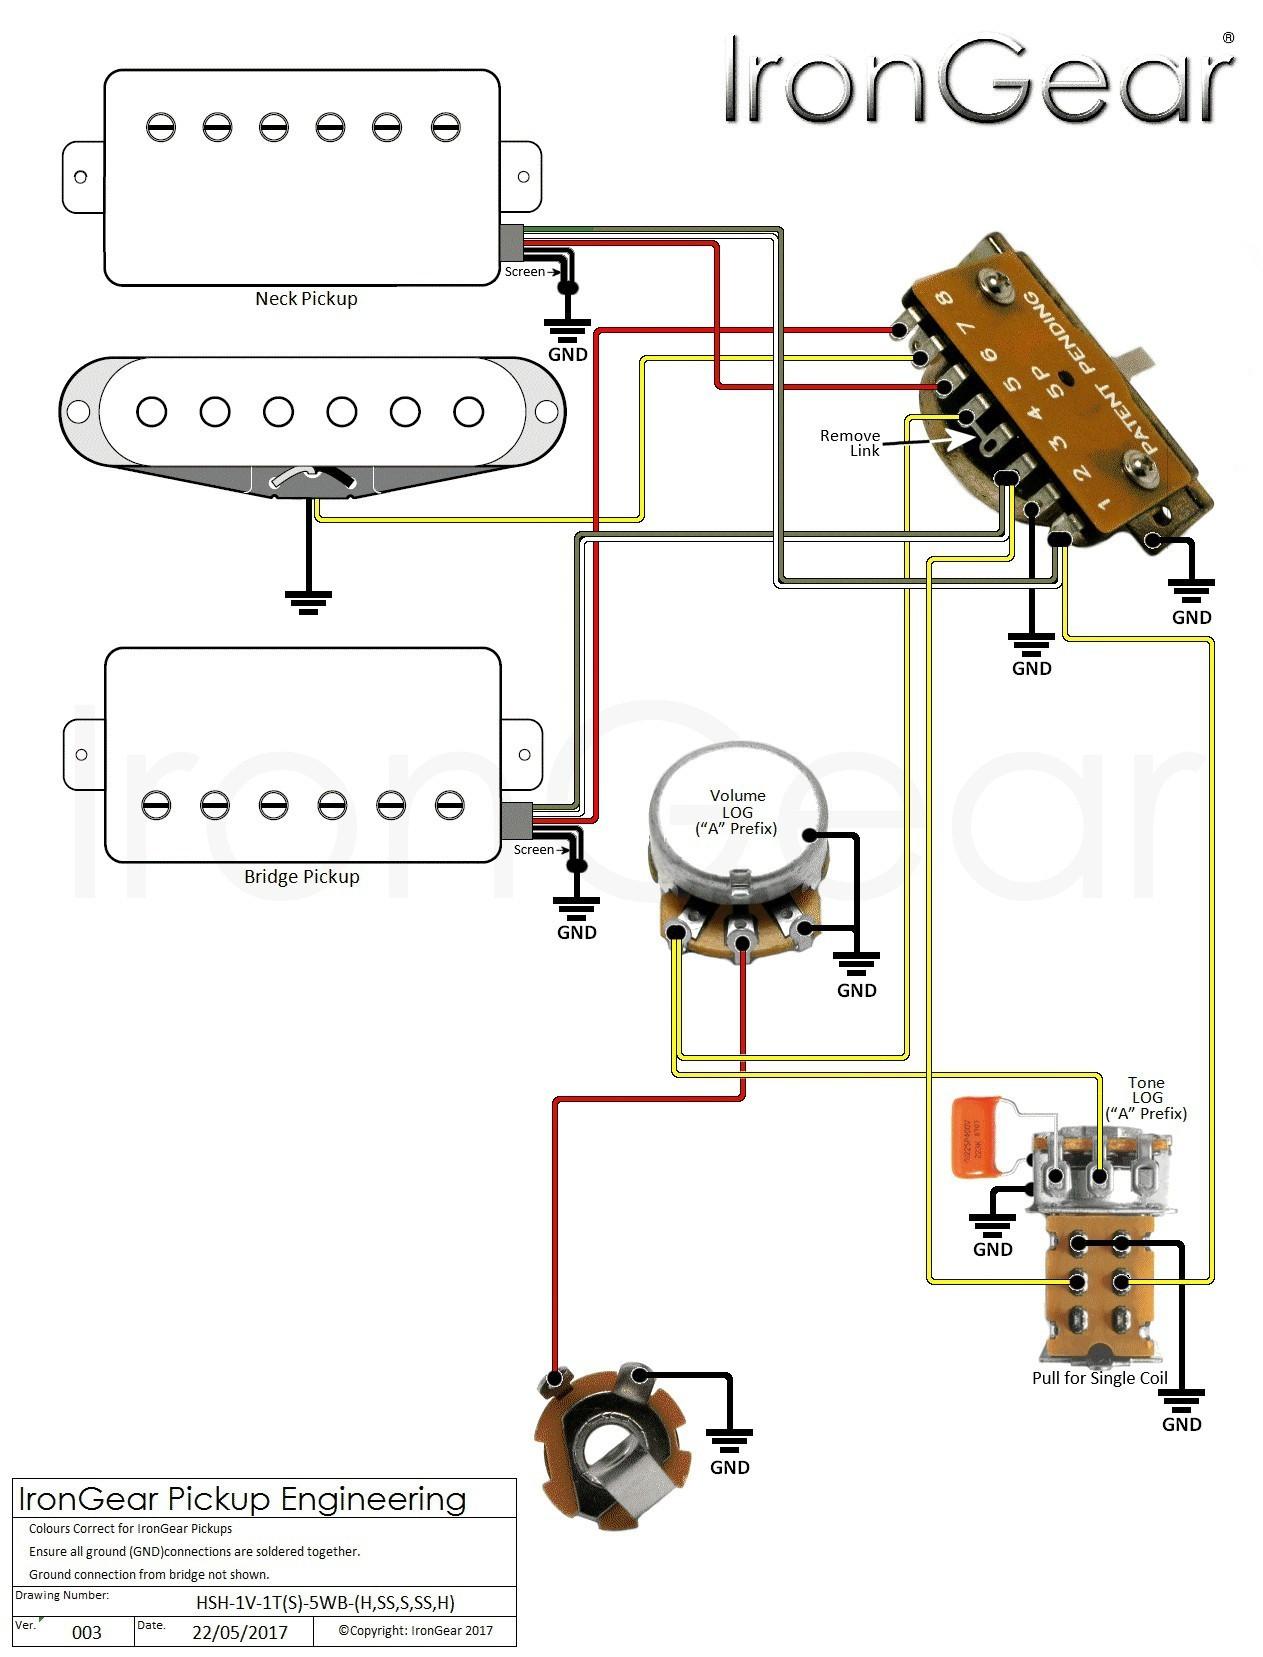 P90 Wiring Diagram Guitar New Wiring Diagram Guitar 3 Way Switch Fresh Guitar Wiring Diagrams 3